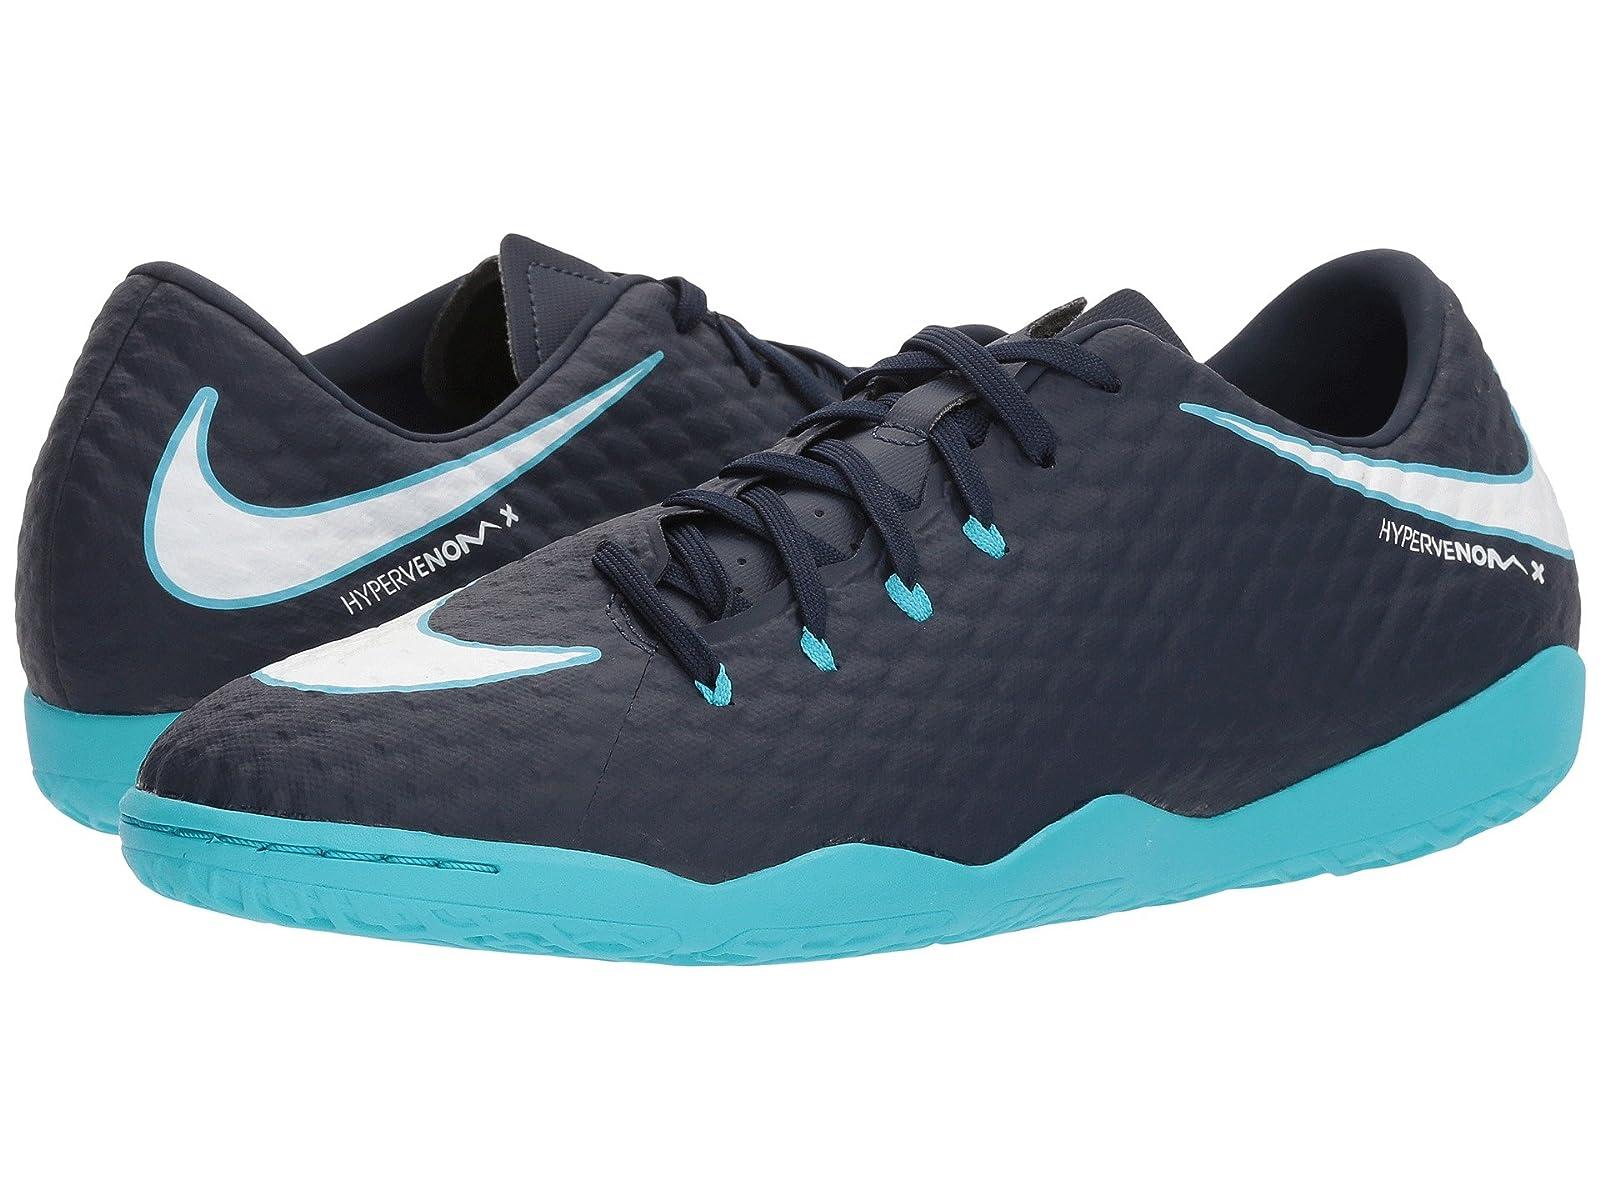 Nike Hypervenom Phelon III ICCheap and distinctive eye-catching shoes